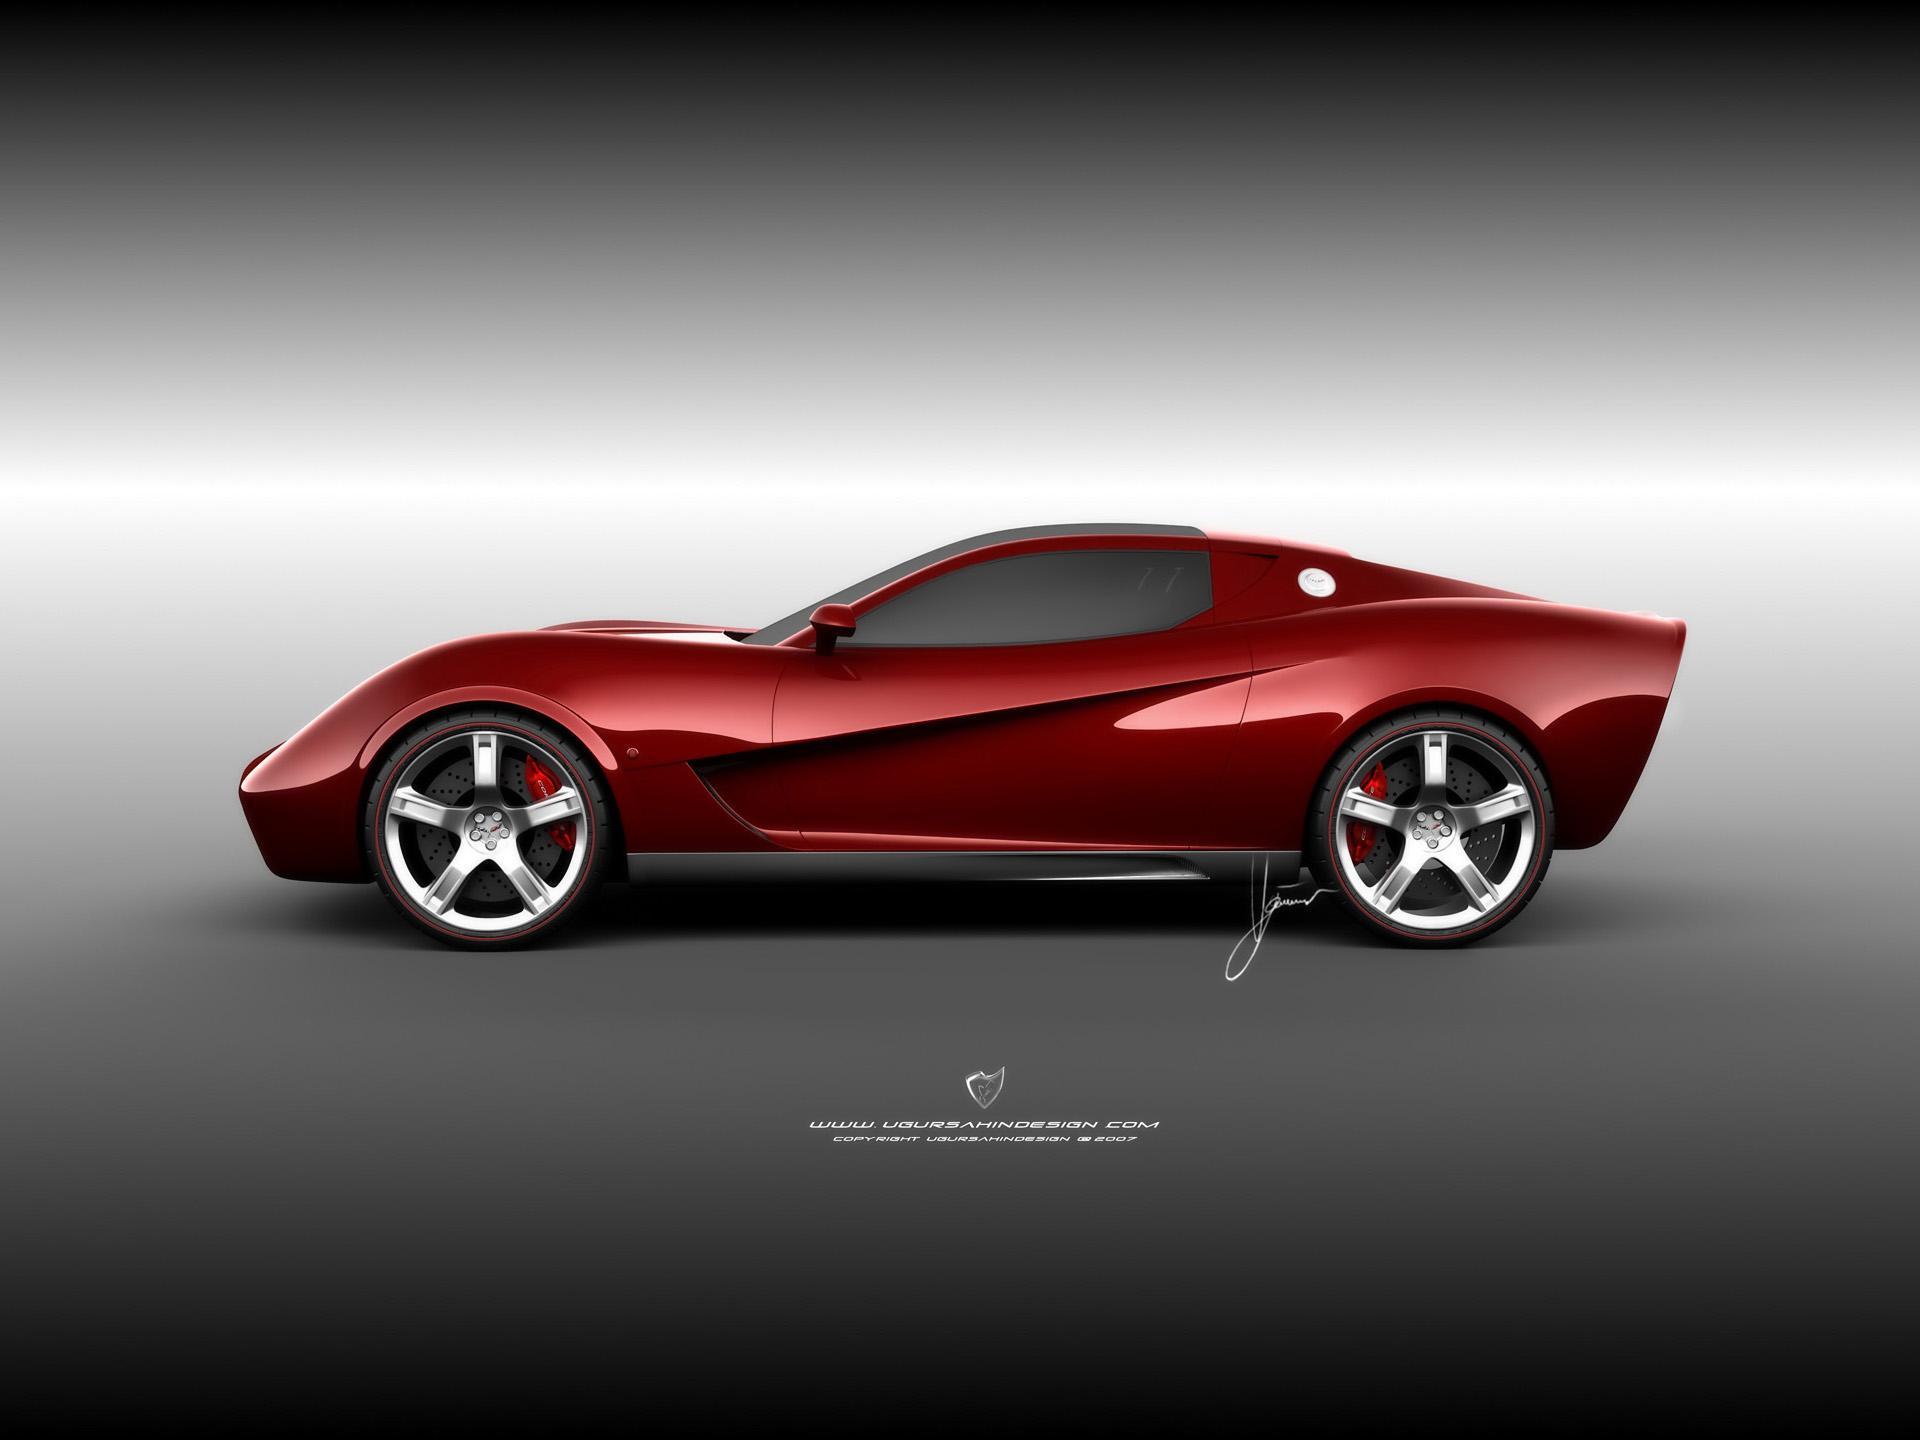 2009 ugur sahin corvette z03 concept. Black Bedroom Furniture Sets. Home Design Ideas